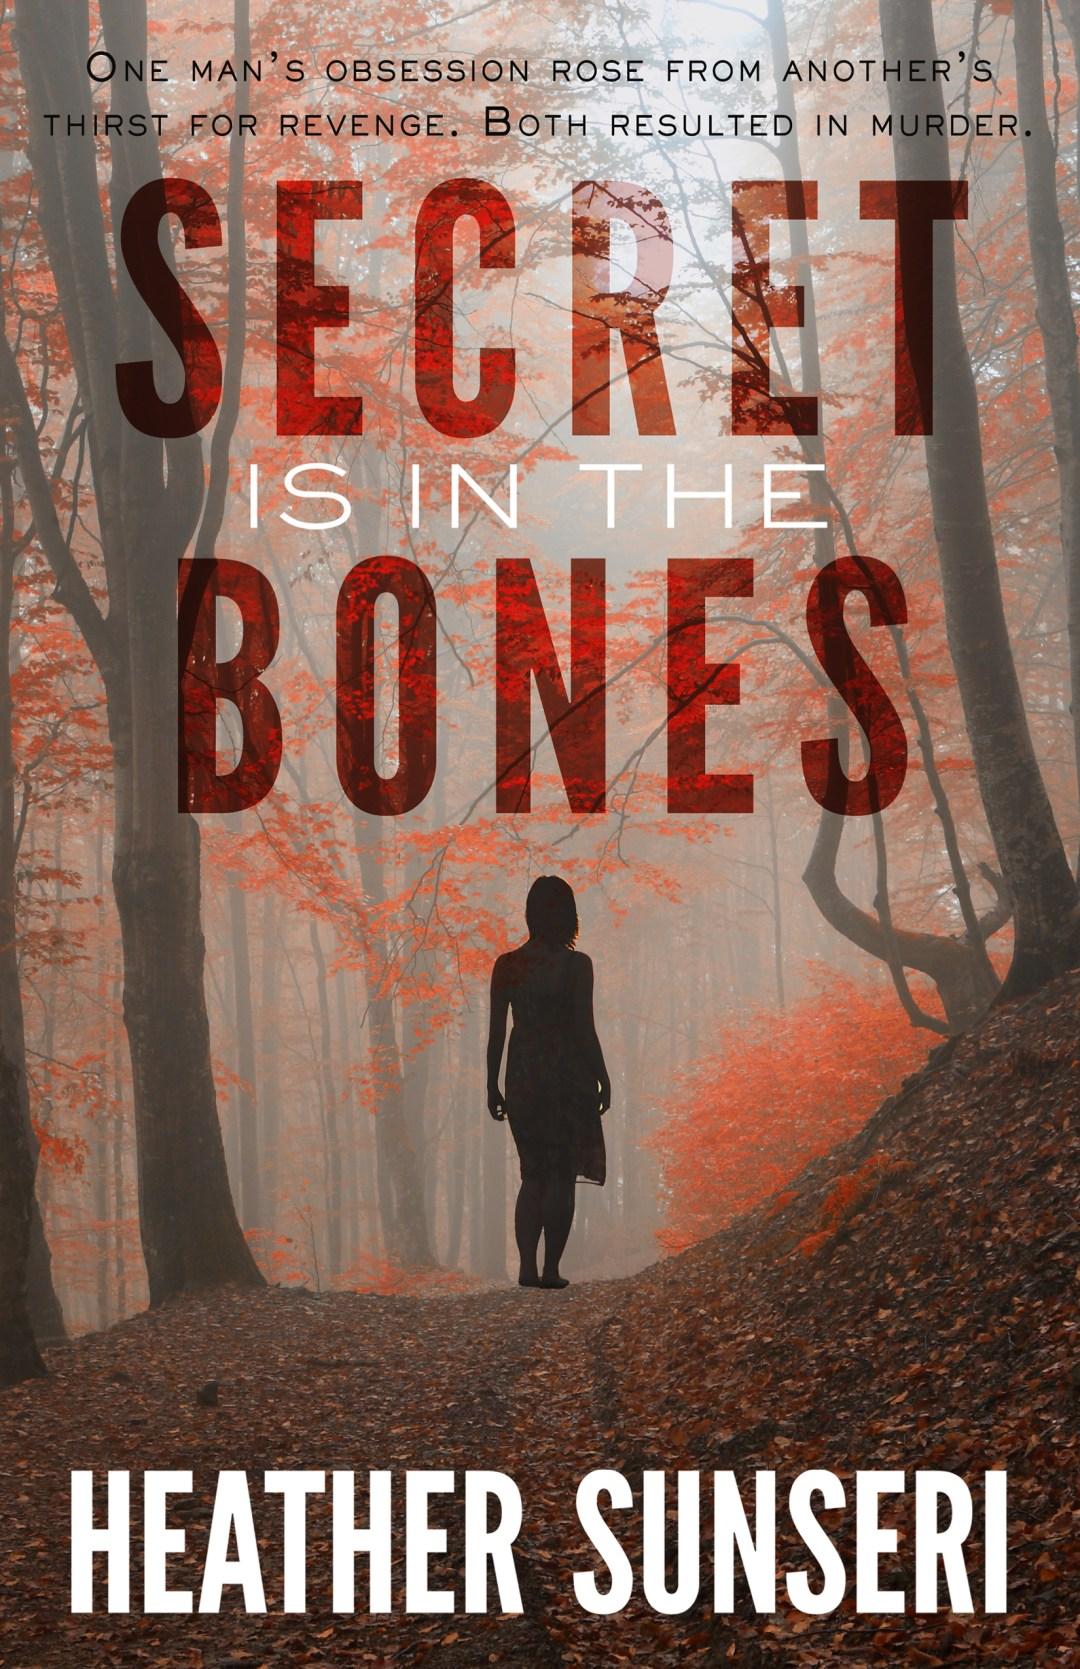 Secret is in the Bones by Heather Sunseri Paynes Creek psychological thriller romantic suspense